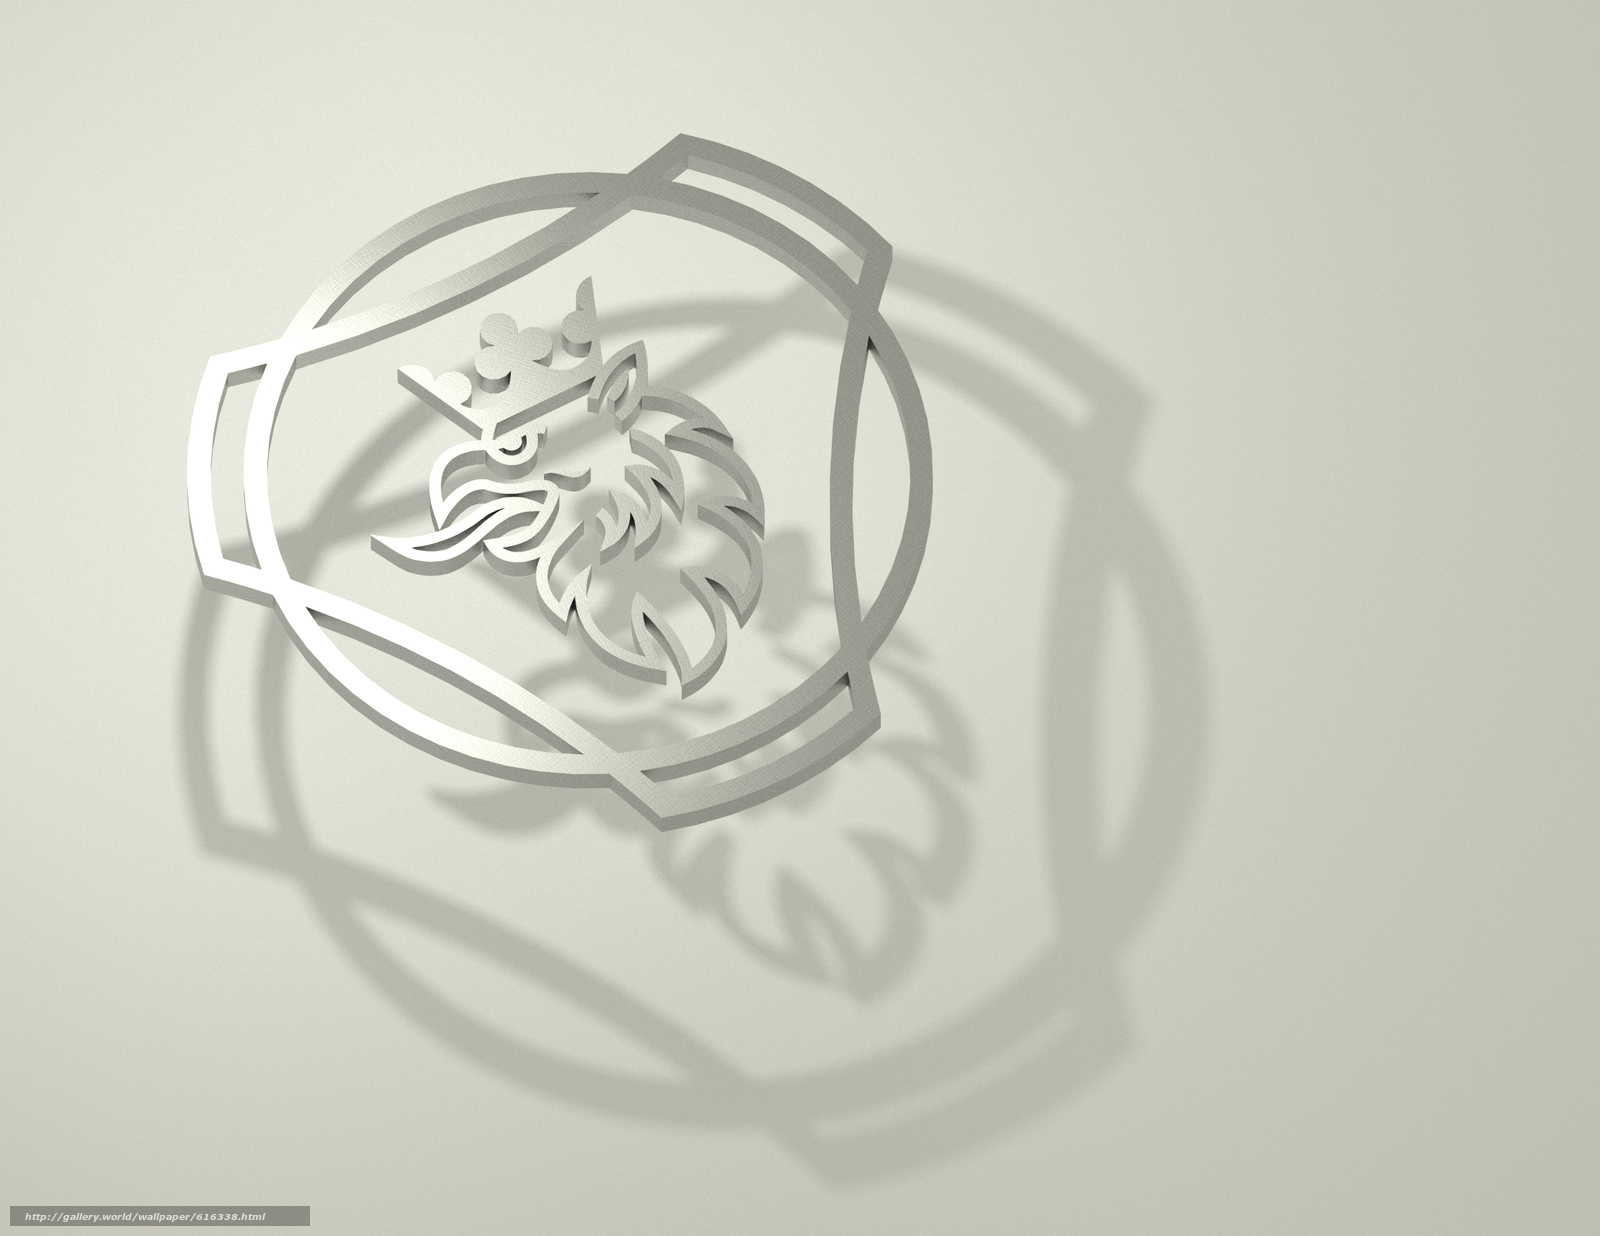 Descargar gratis Scania_logo,  Scania,  Grifo,  Logo en venta Fondos de escritorio en la resolucin 3300x2550 — imagen №616338